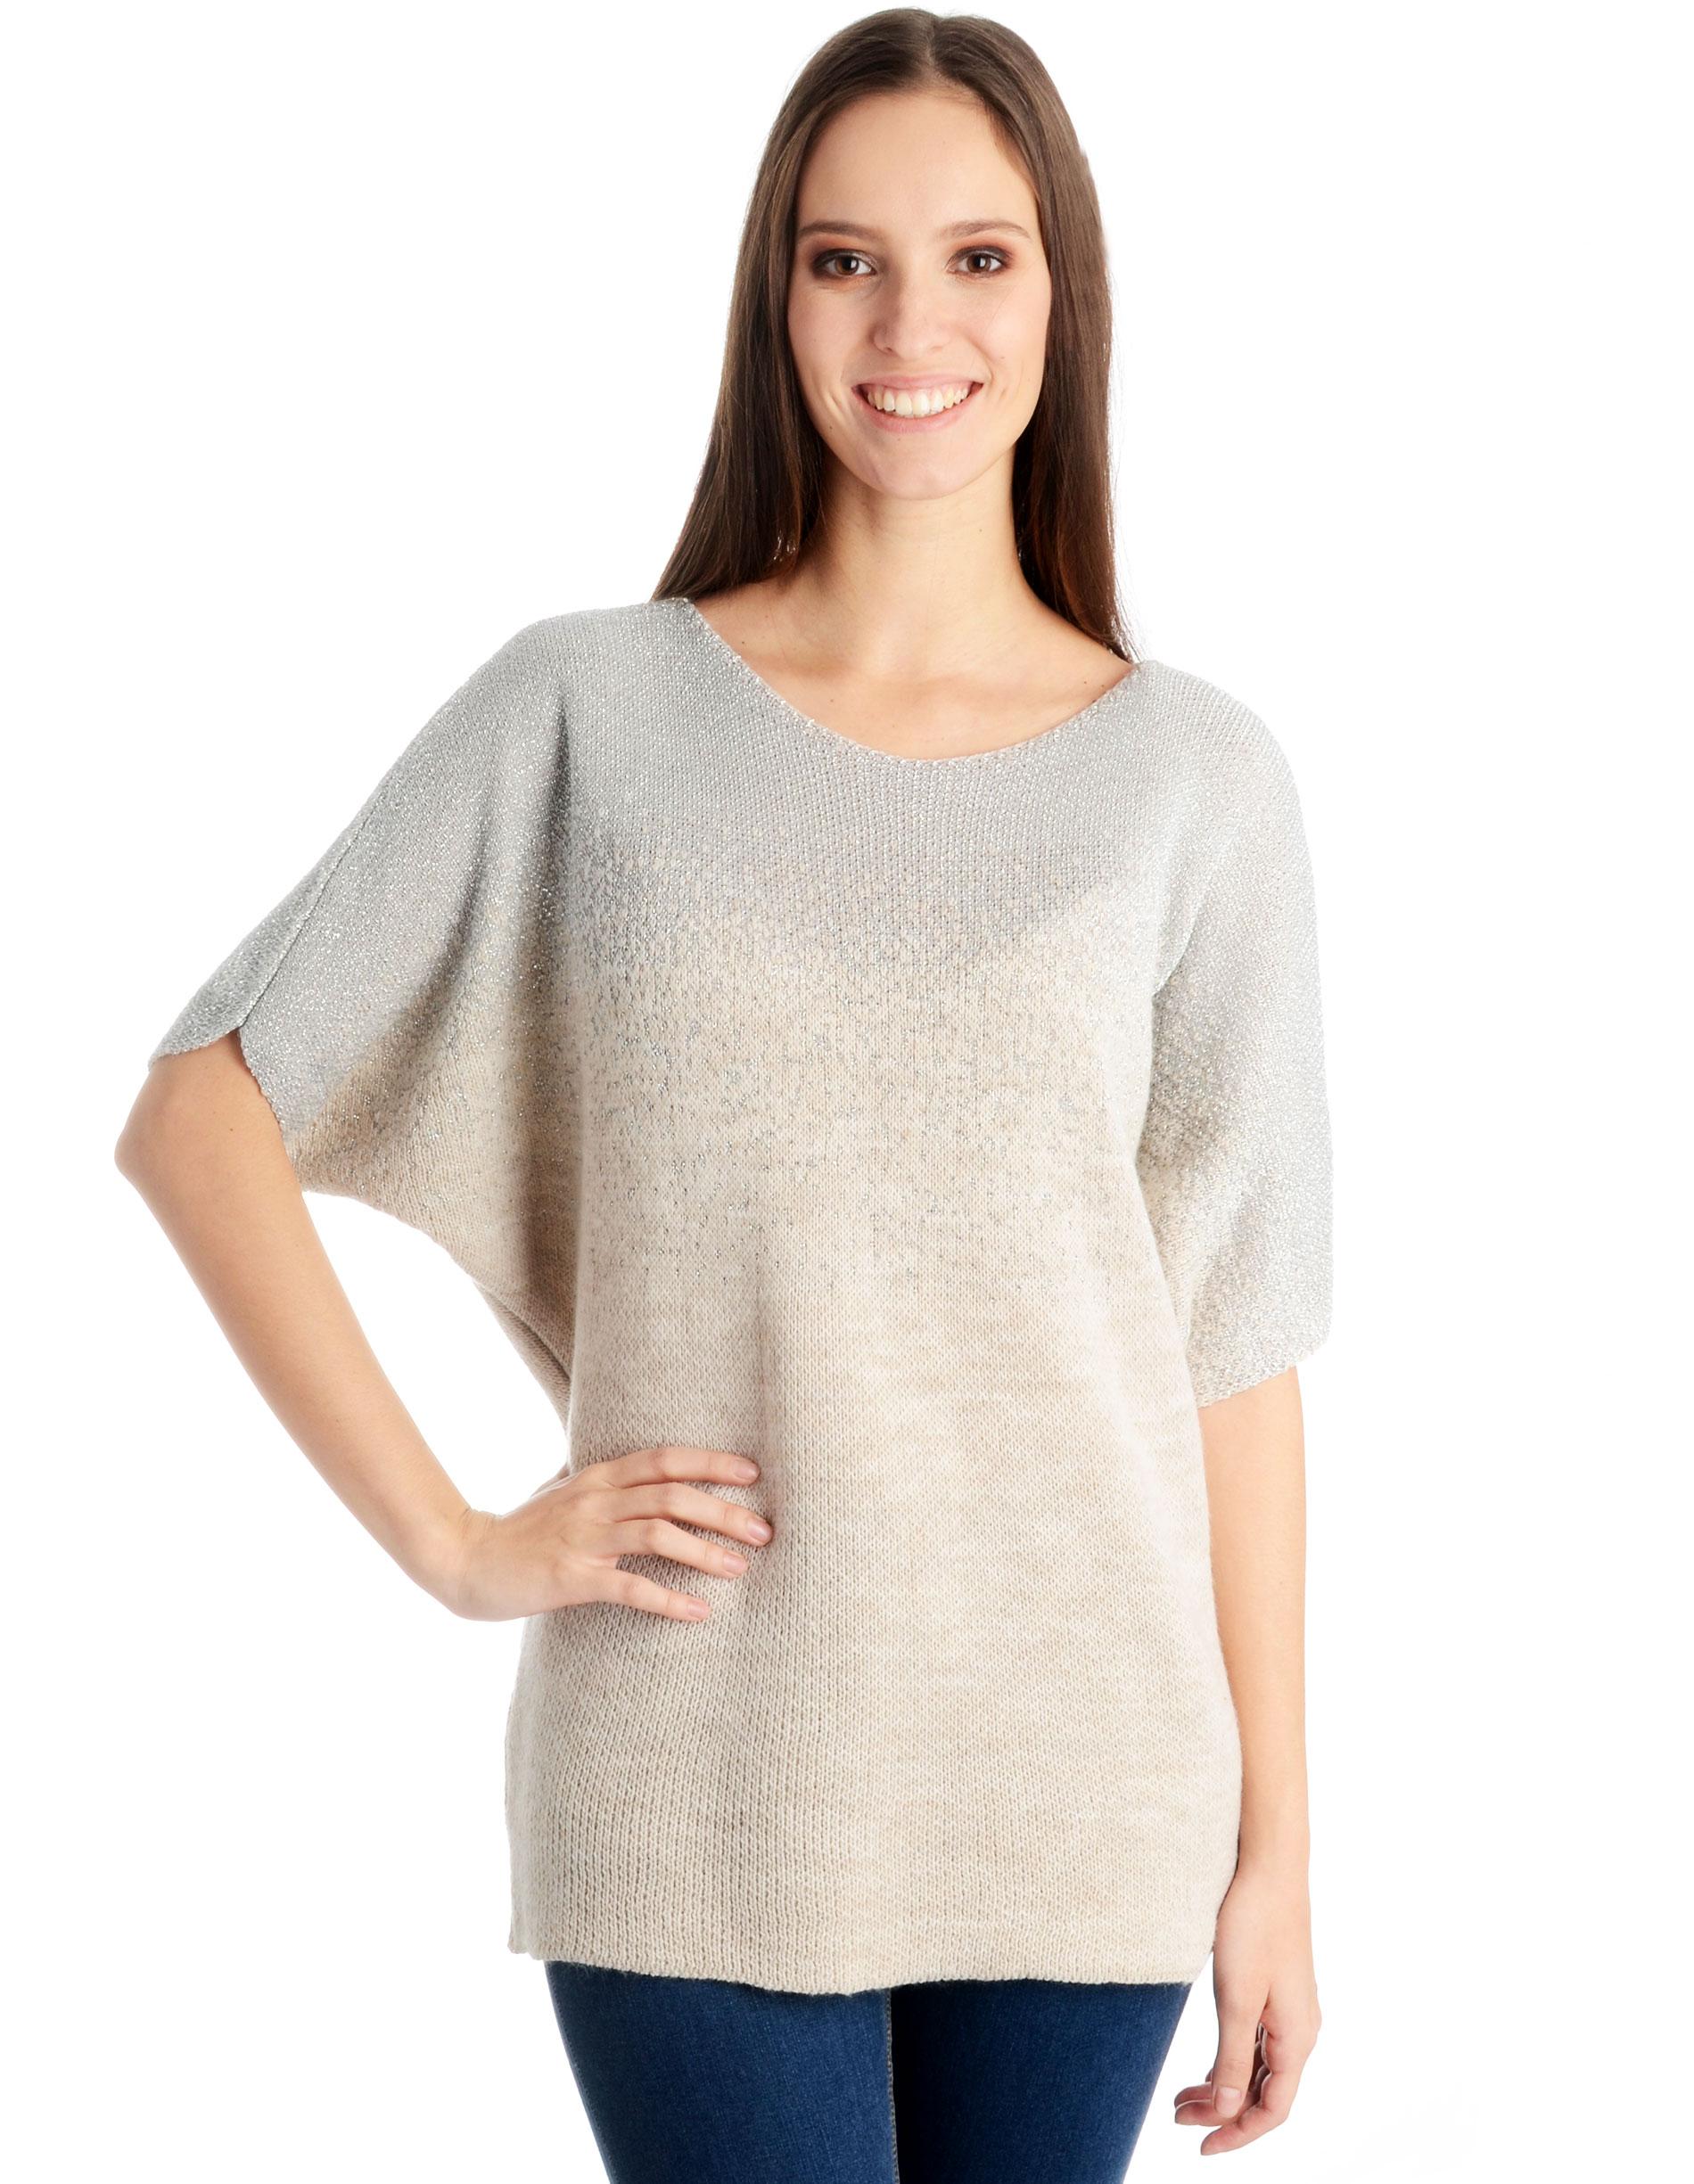 Sweter - 4-5126-1 BC-A - Unisono